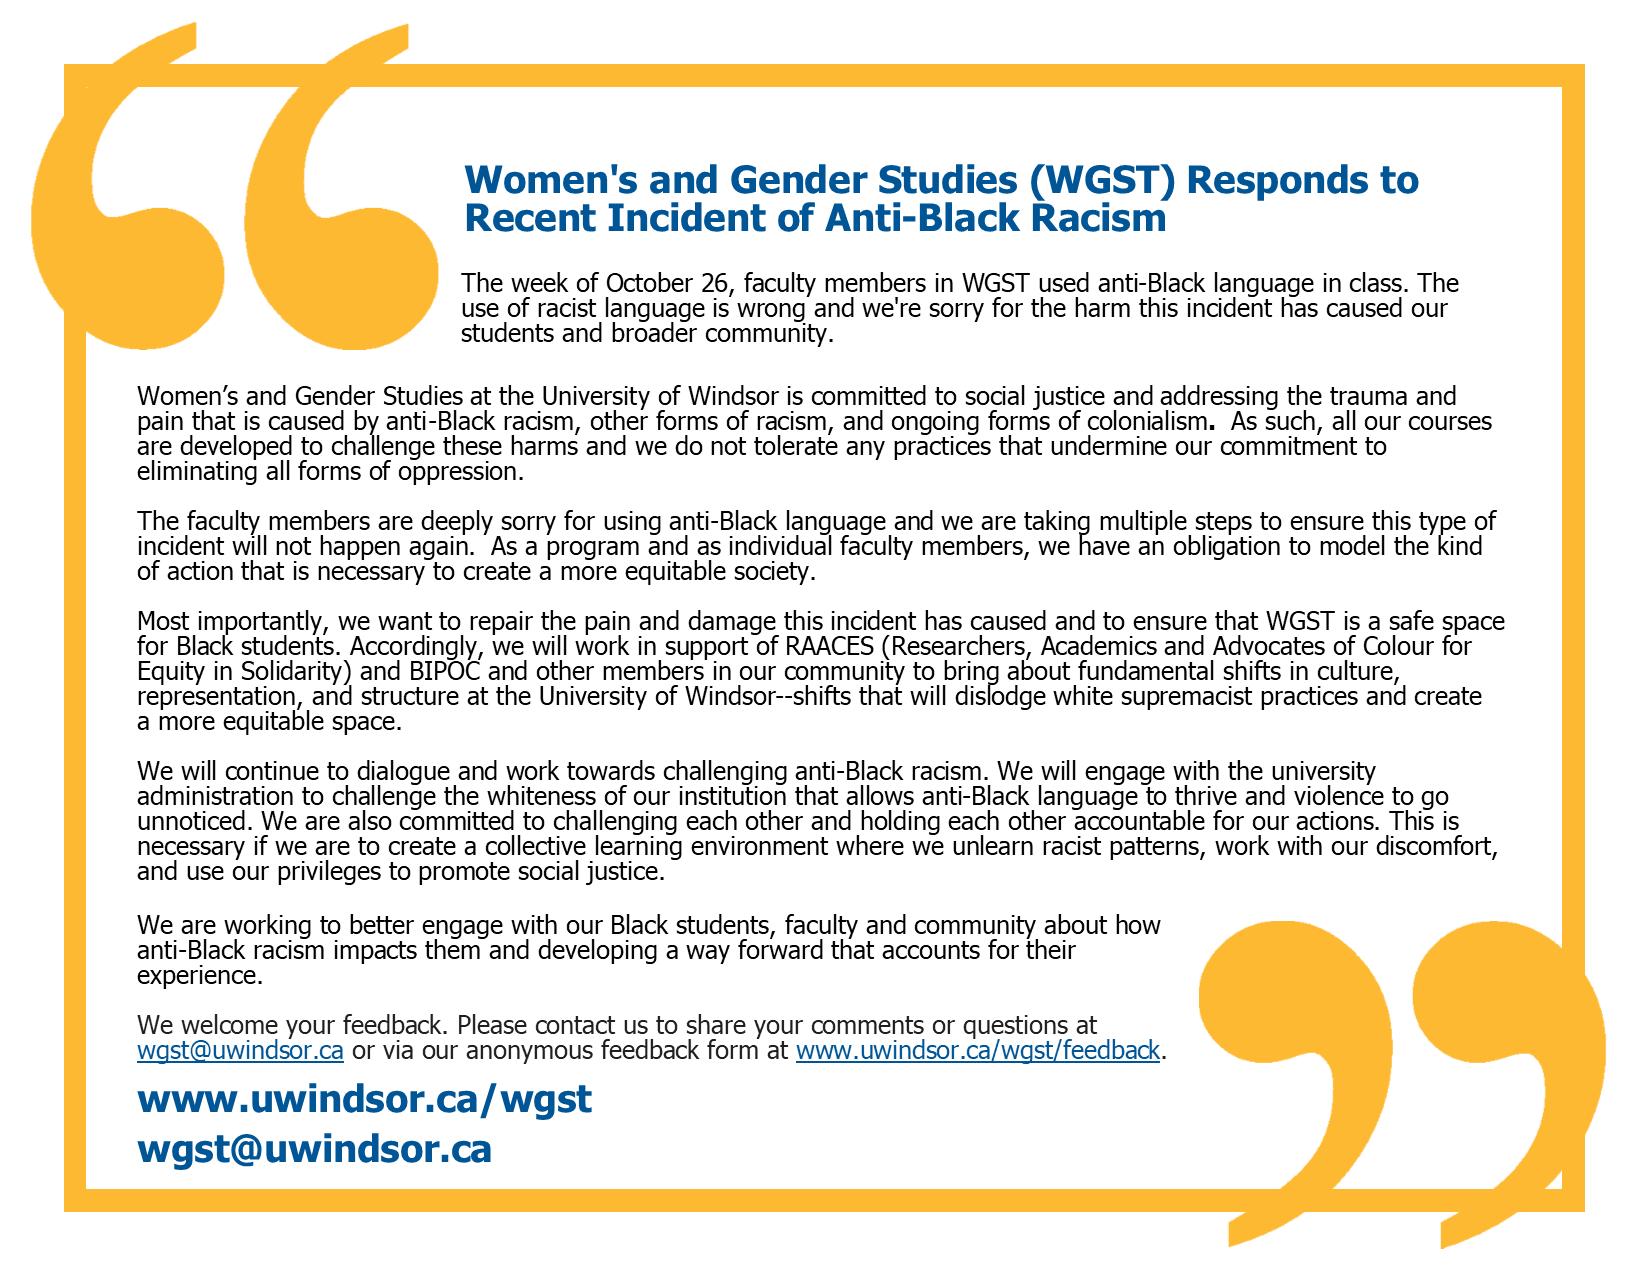 WGST response to anti-Black racsim